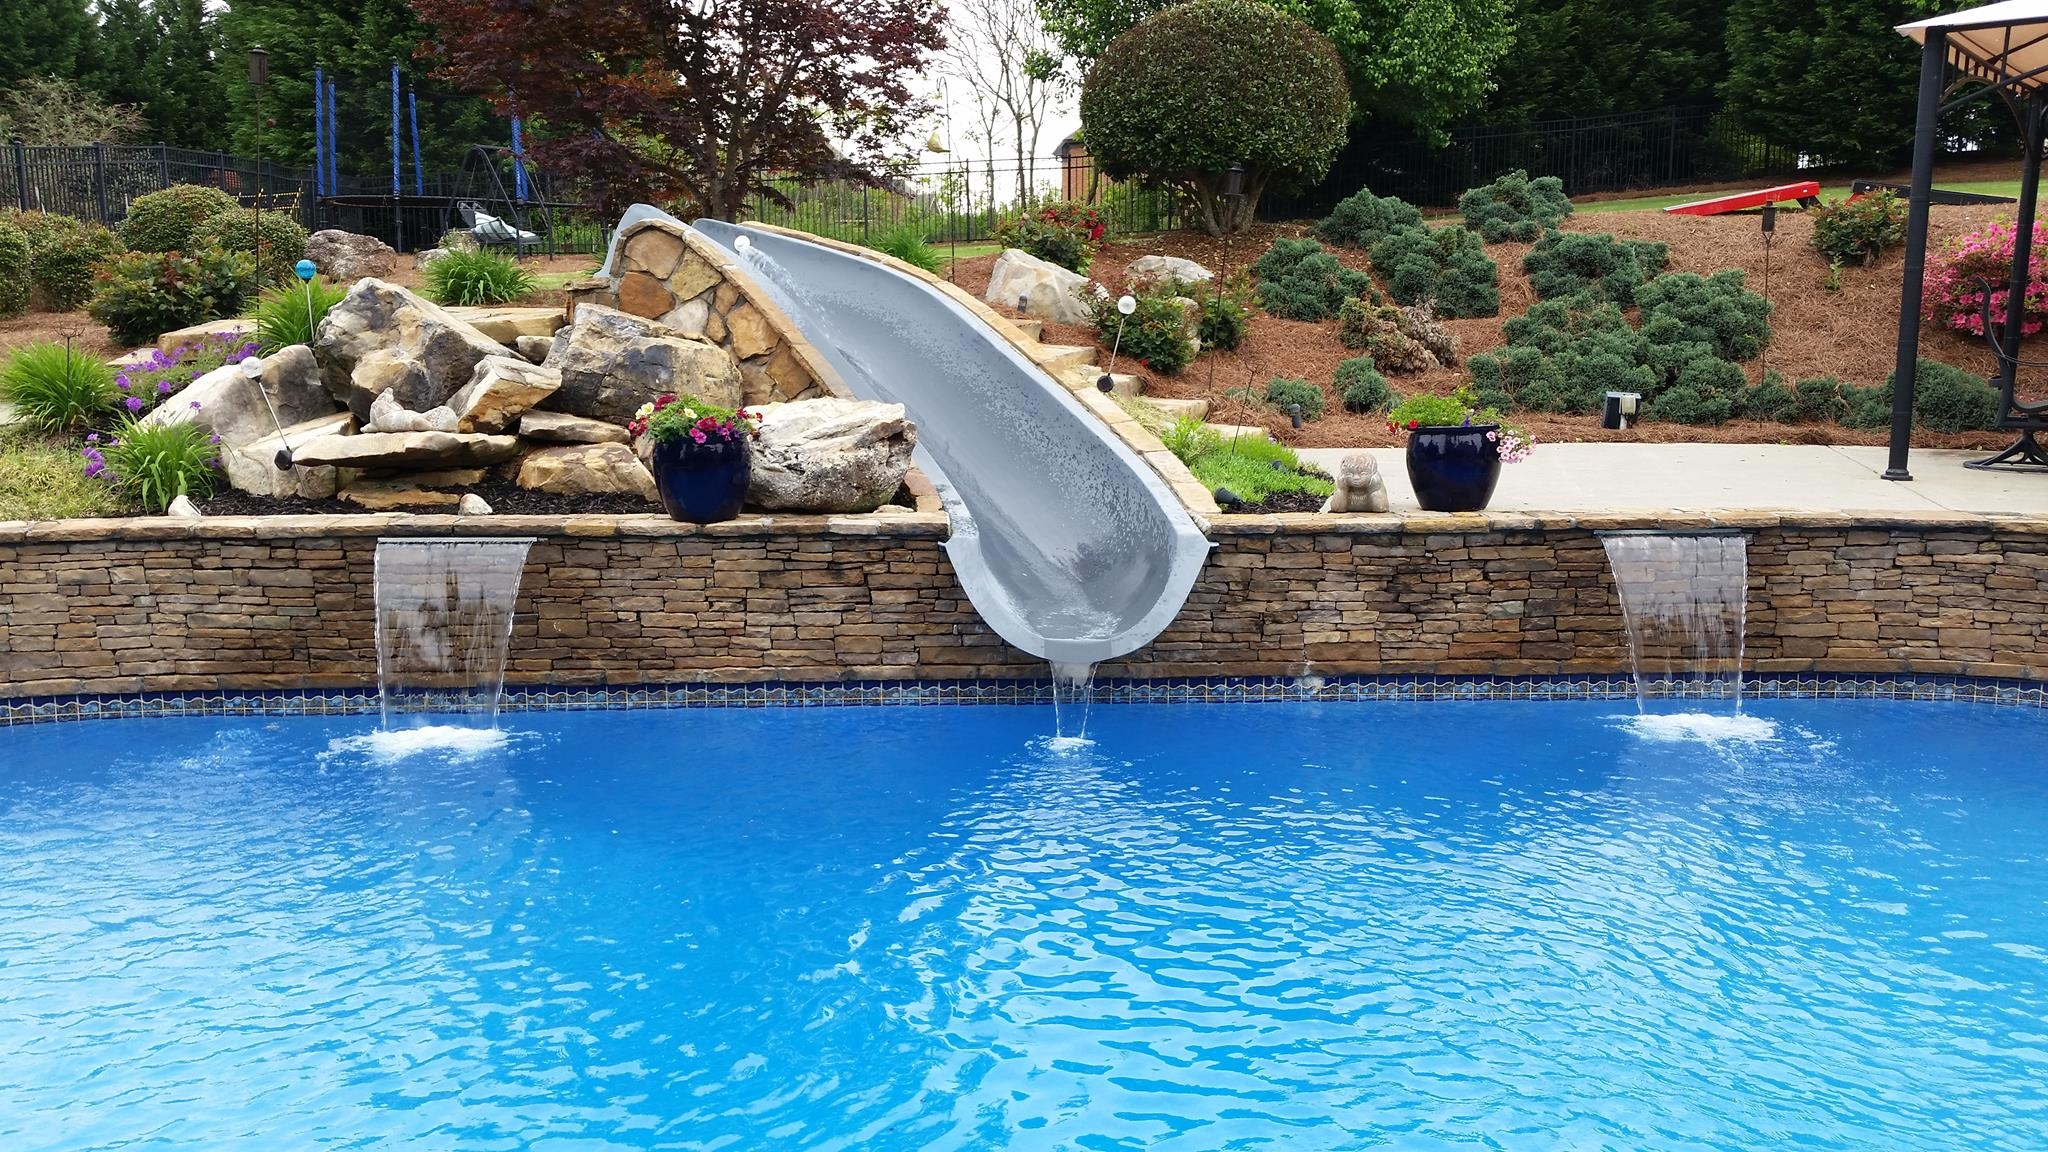 Sunrise Pool Services image 3